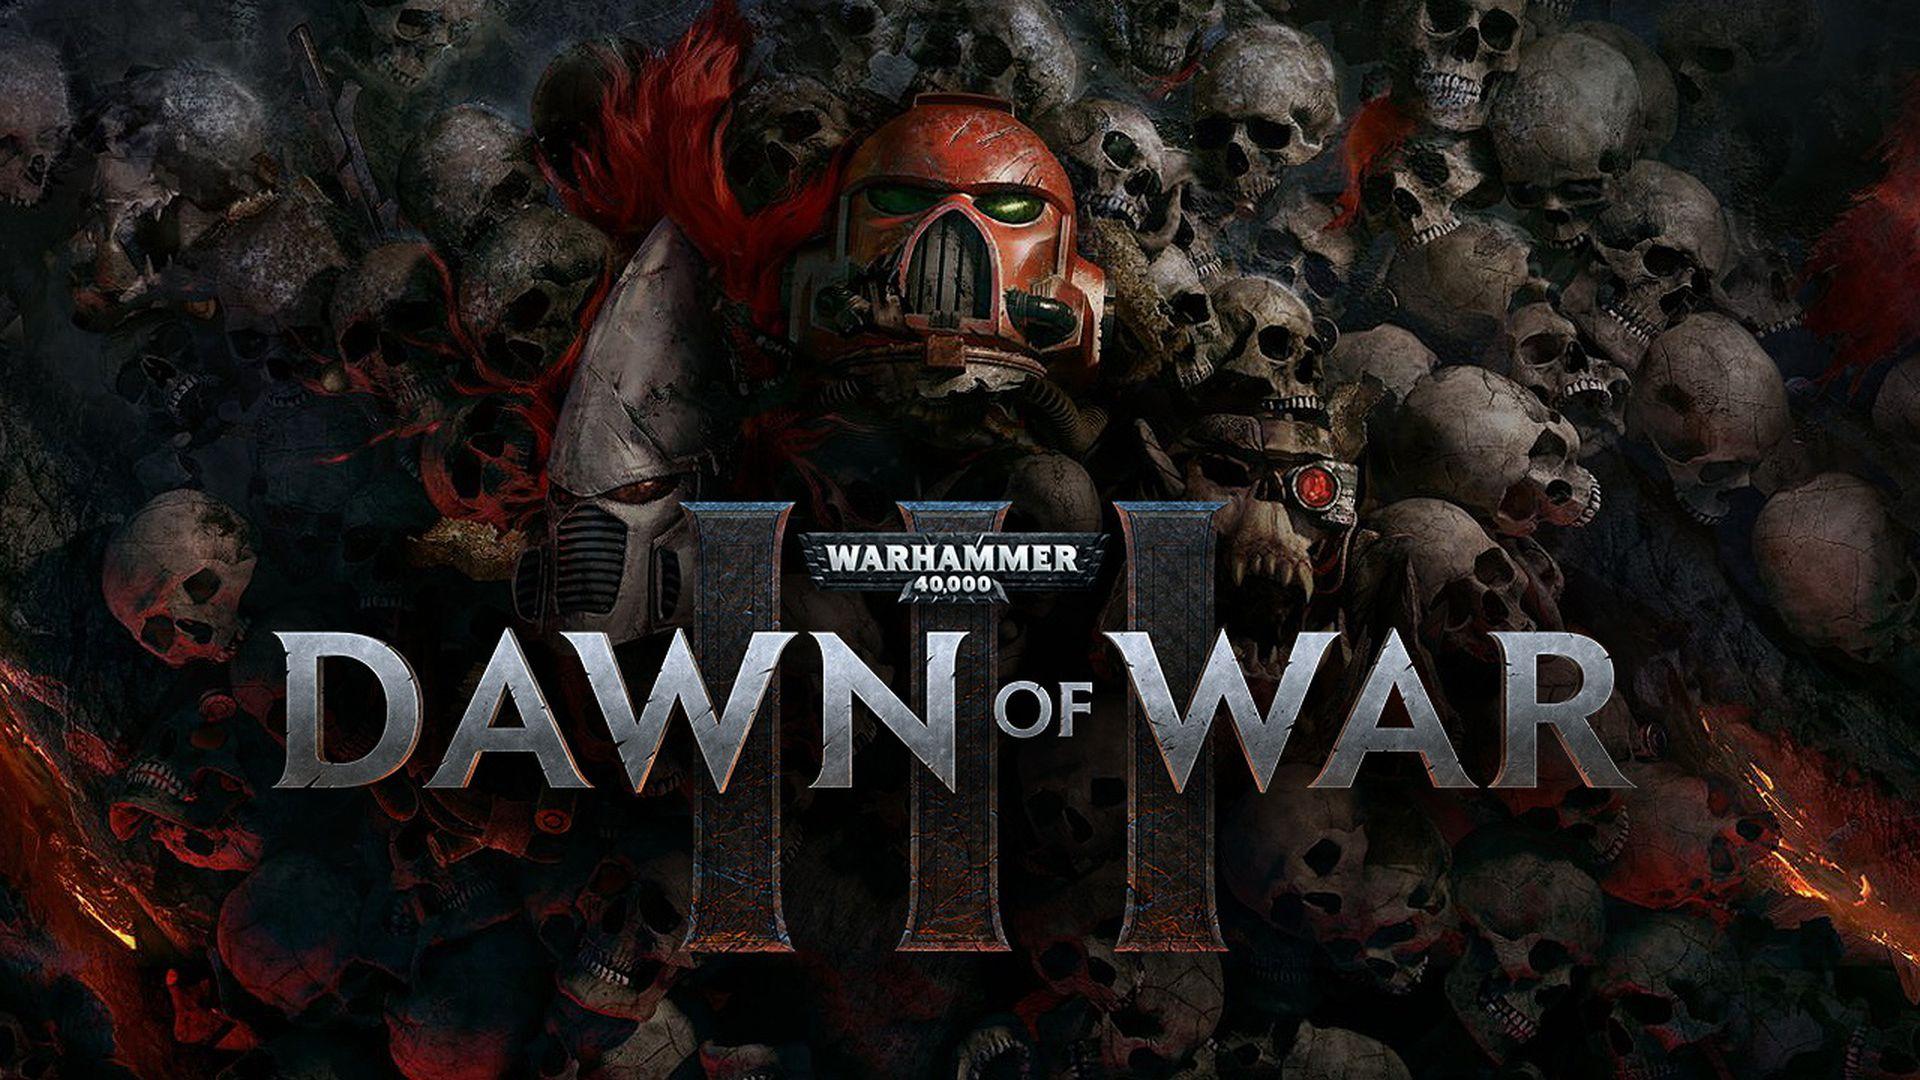 Warhammer 40,000: Dawn of War 3